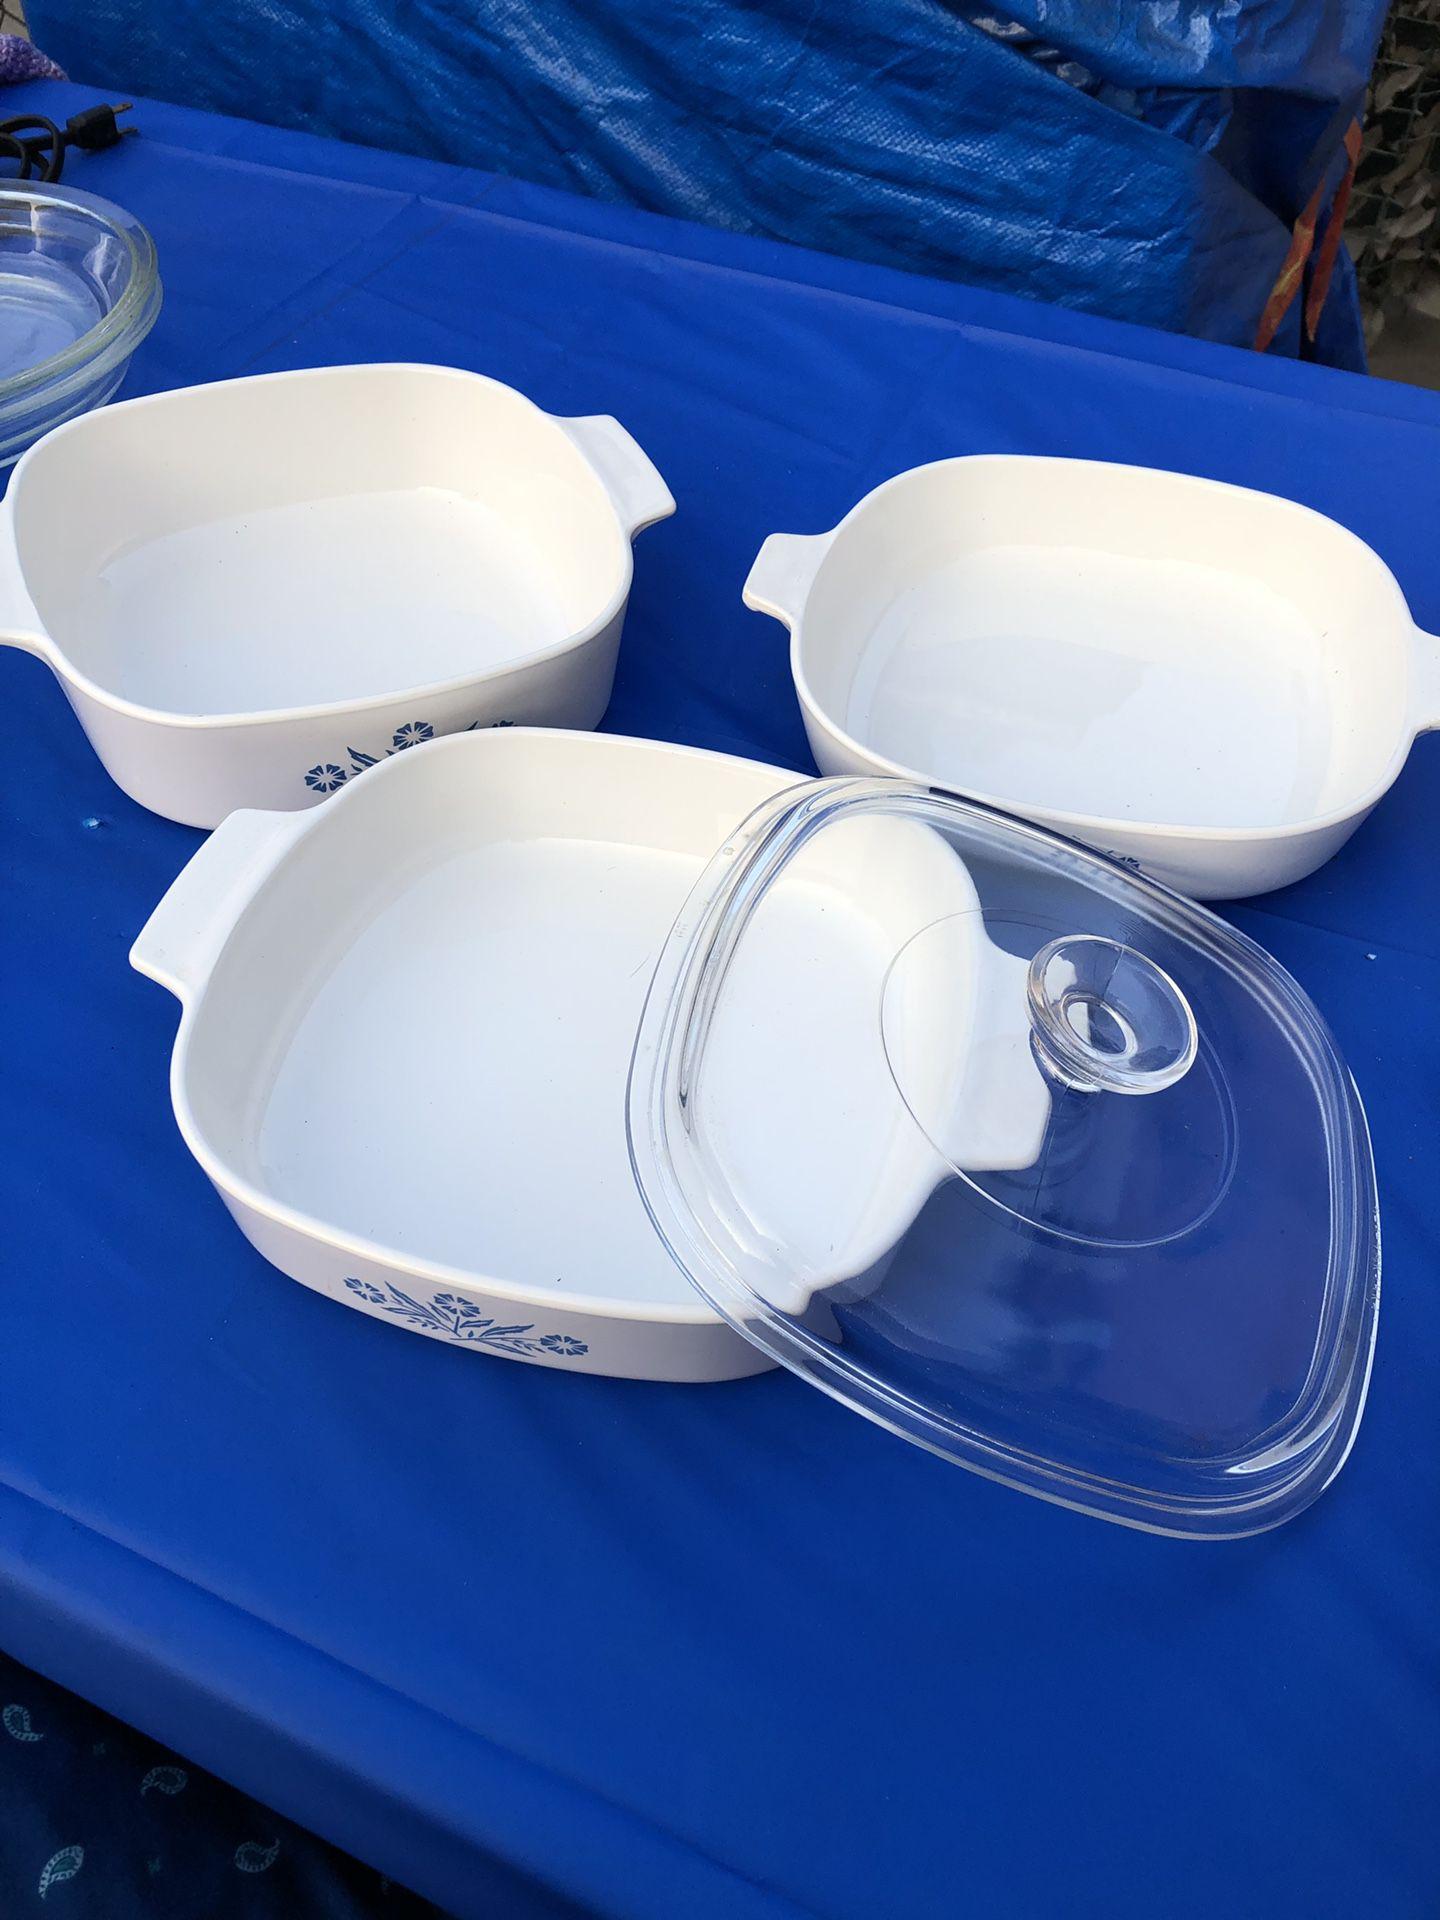 4-Piece Corningware Set